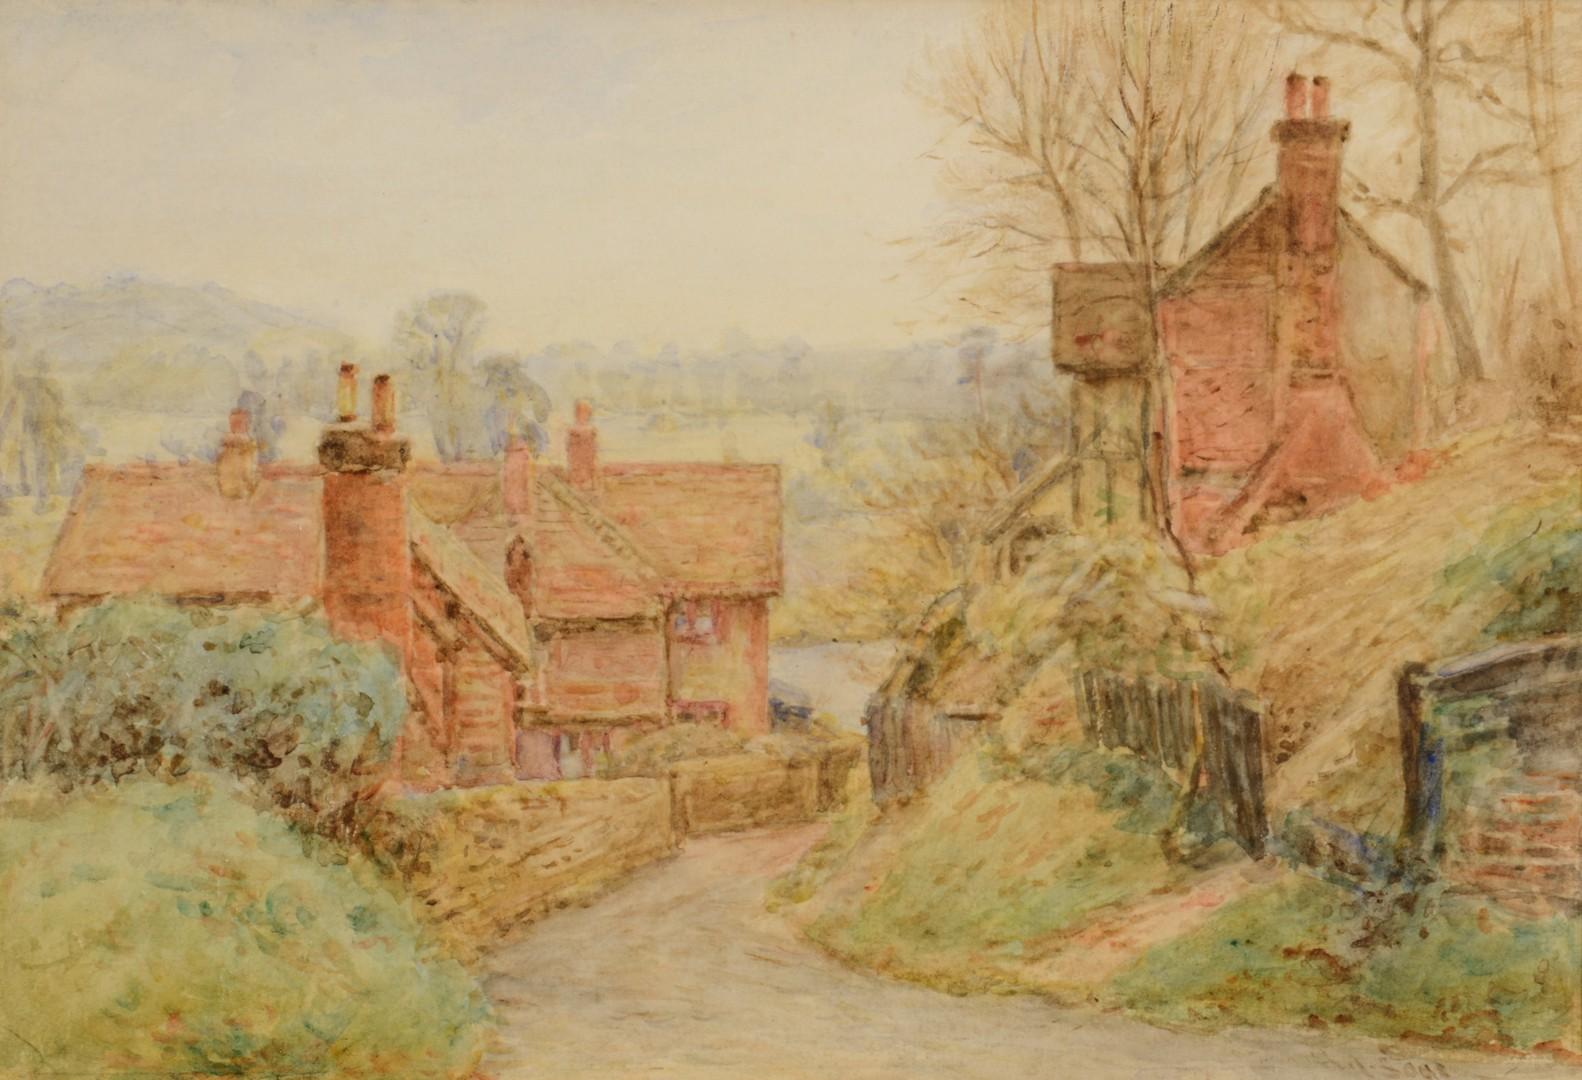 Lot 770: Henry James Sage, 3 British Watercolors